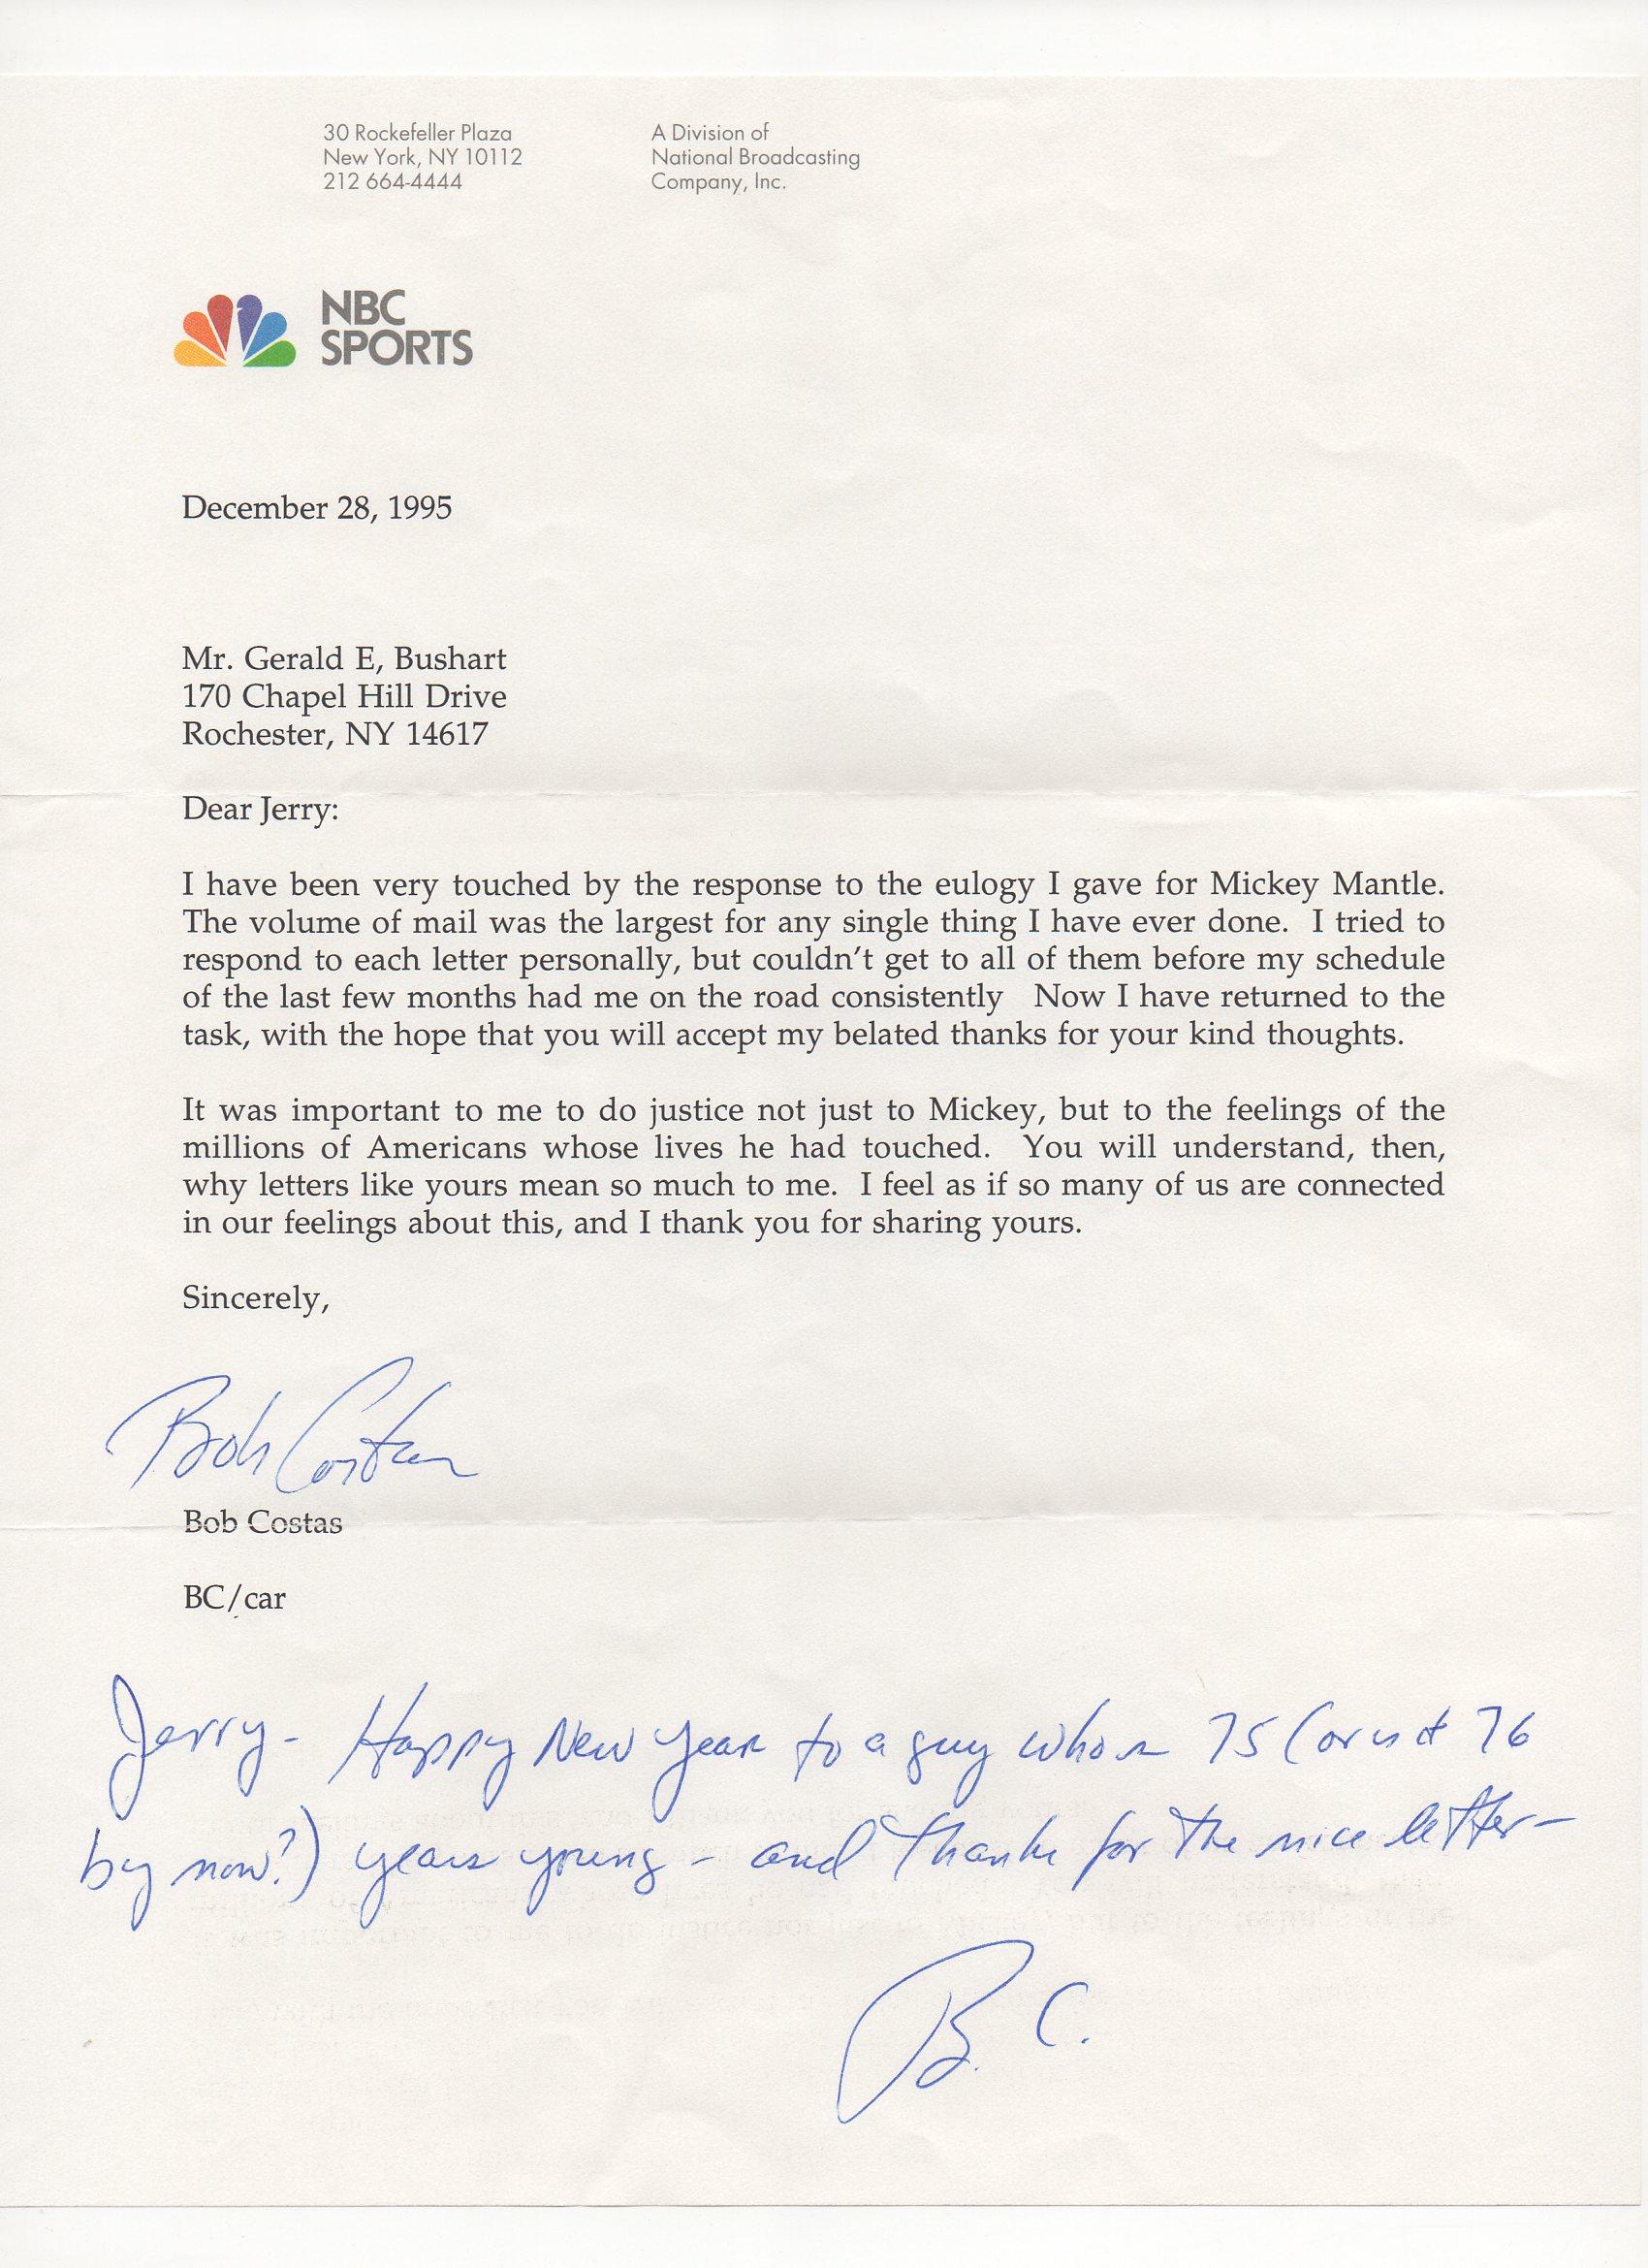 1995 nbc sports, bob costas